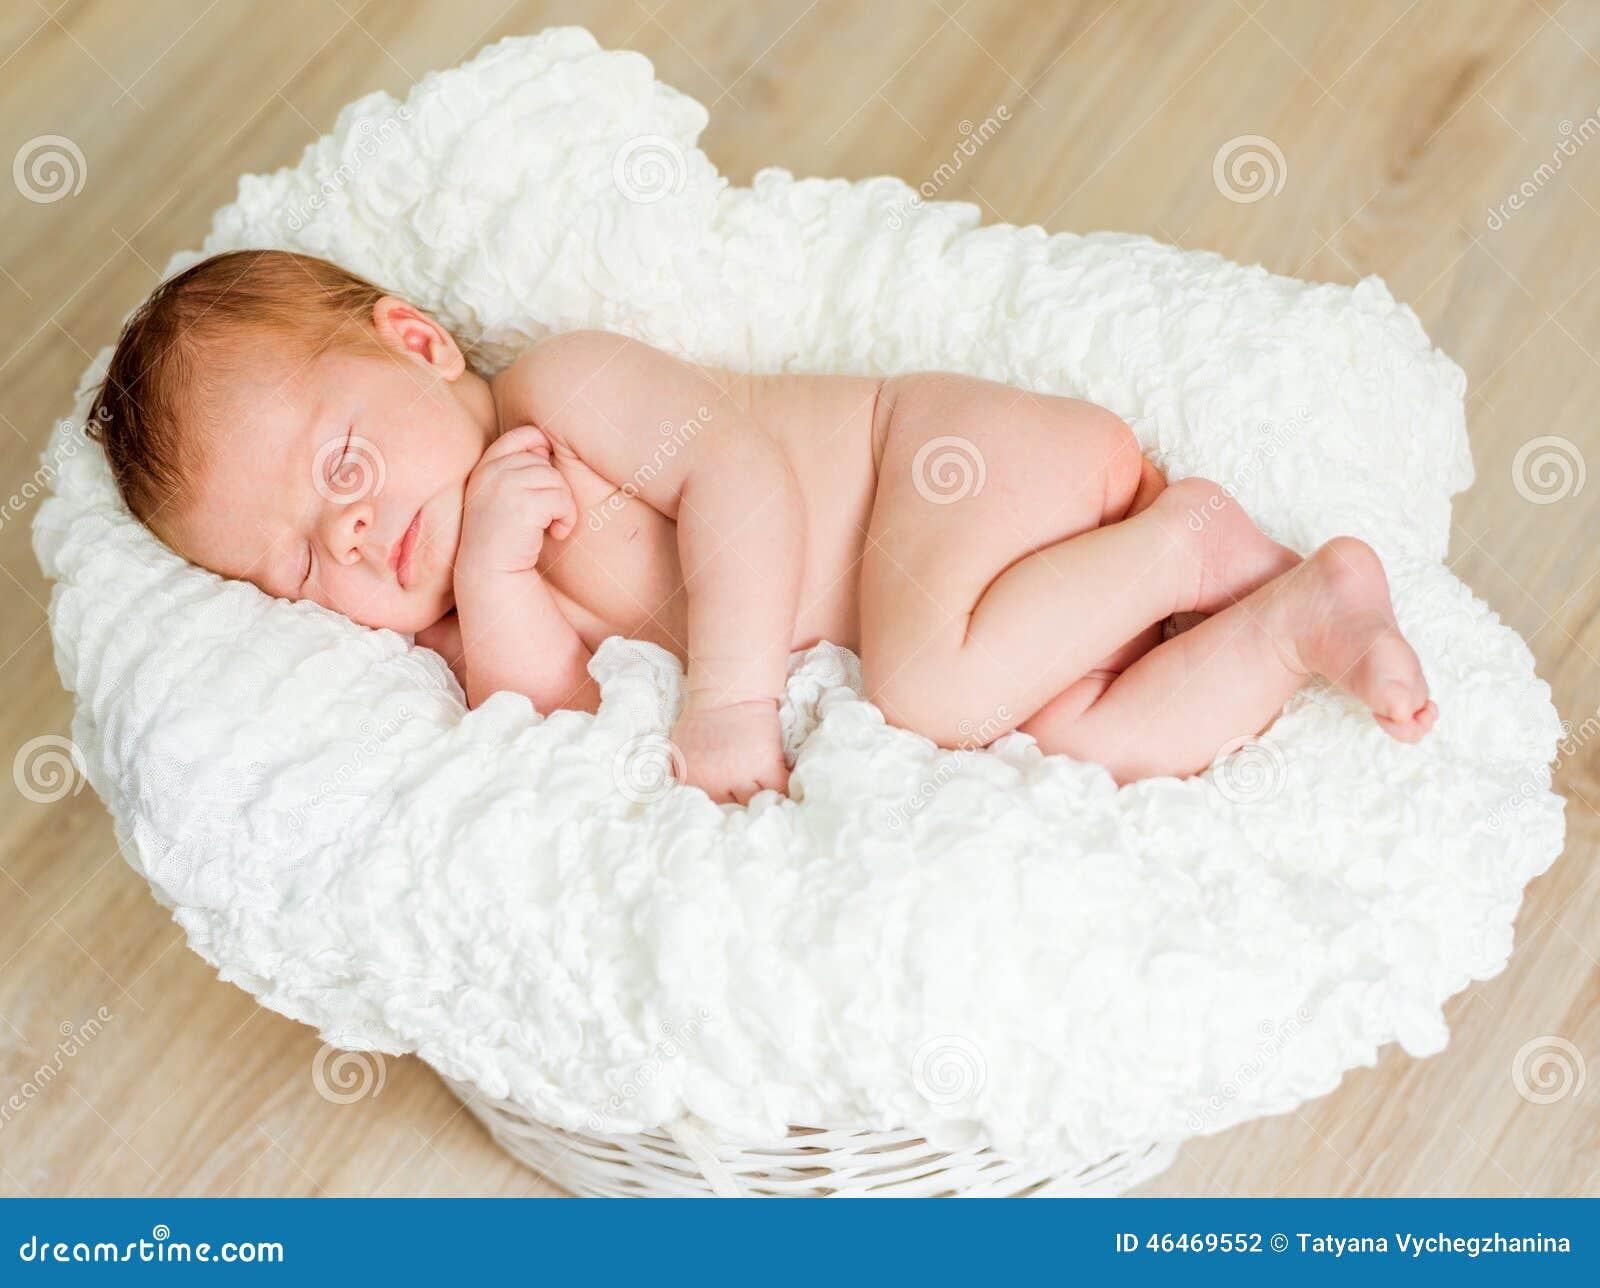 f16fa2ff4 Lovely newborn baby sleeps stock photo. Image of male - 46469552